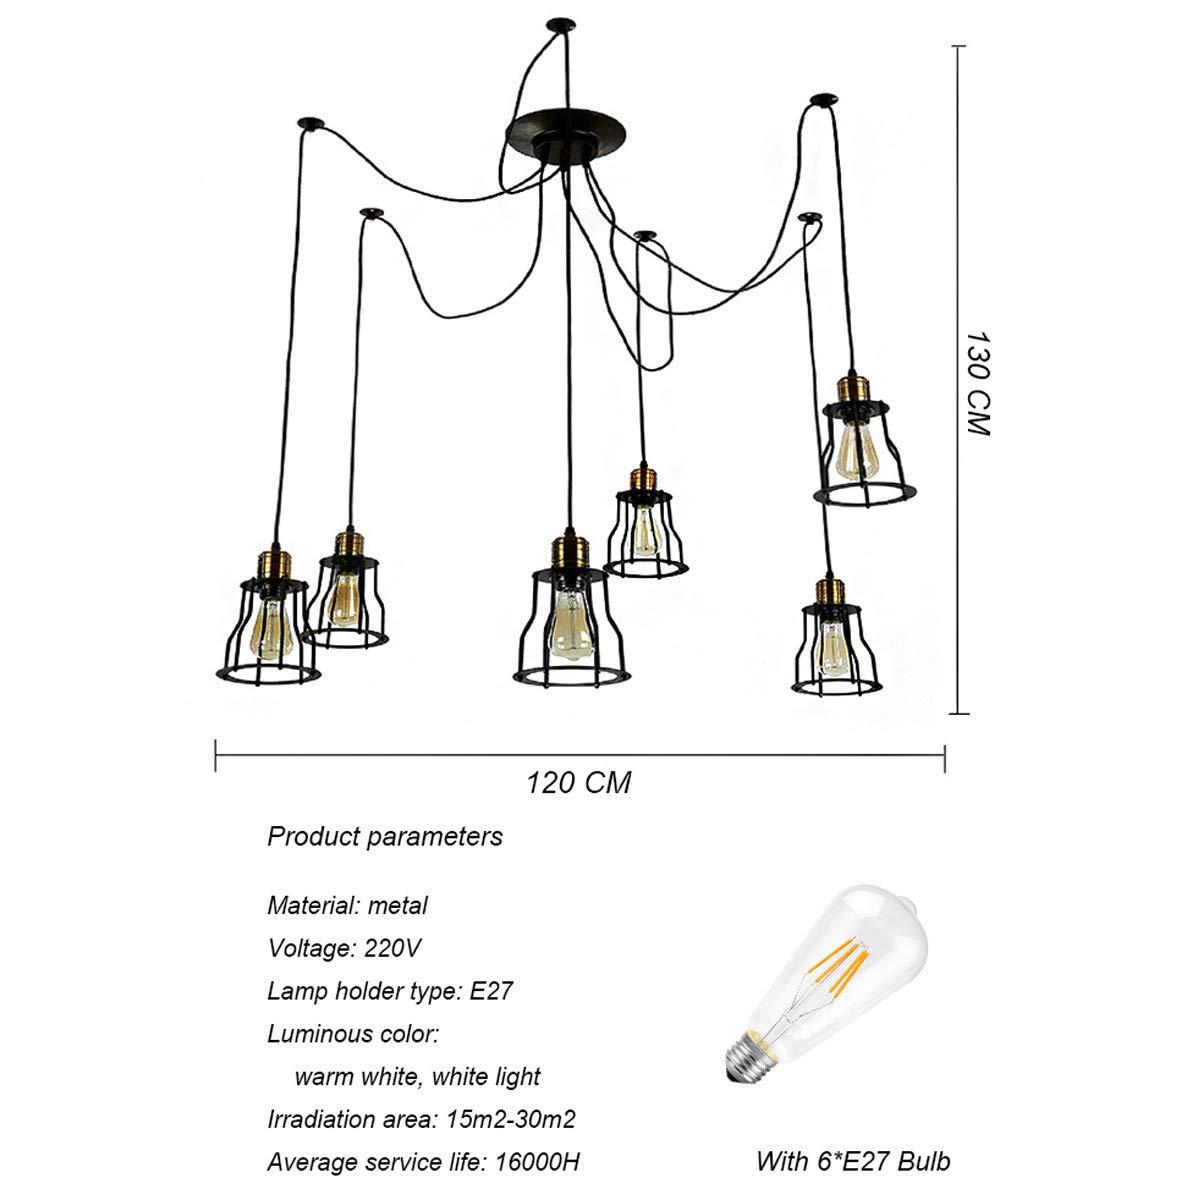 NANGE Vintage Chandelier,Edison Multiple Adjustable DIY Metal Wire Cage Pendant Lighting,Modern Chic Industrial Dining Light,E27(Without Light Source) (Color : Warm White, Size : AC 220V) by NANGE (Image #2)